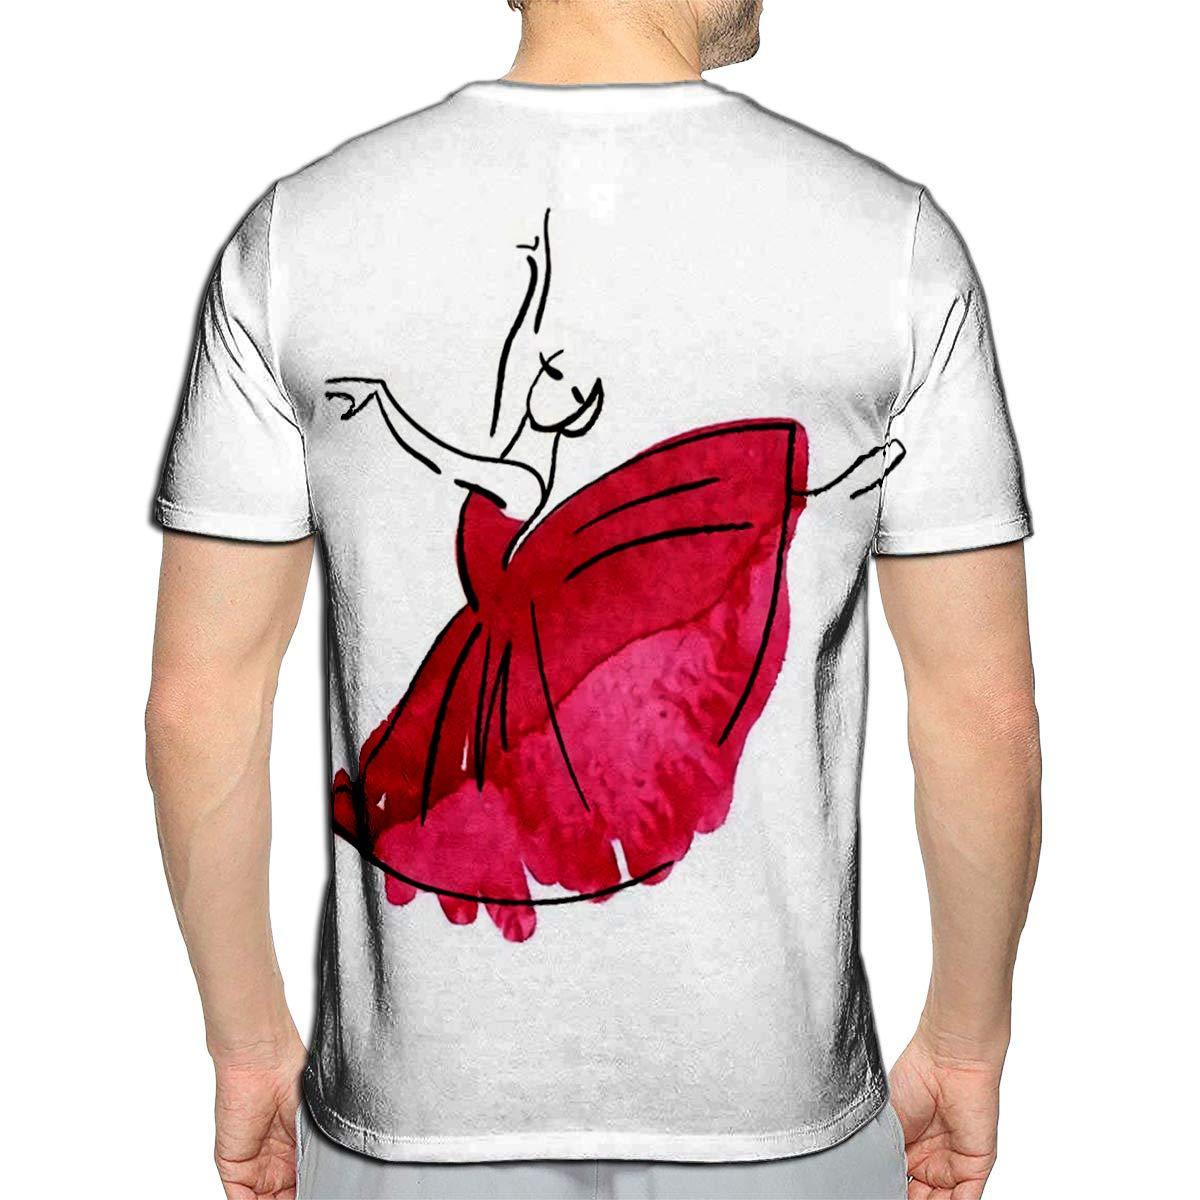 Randell 3D Printed T-Shirts Pink Flamingo Short Sleeve Tops Tees